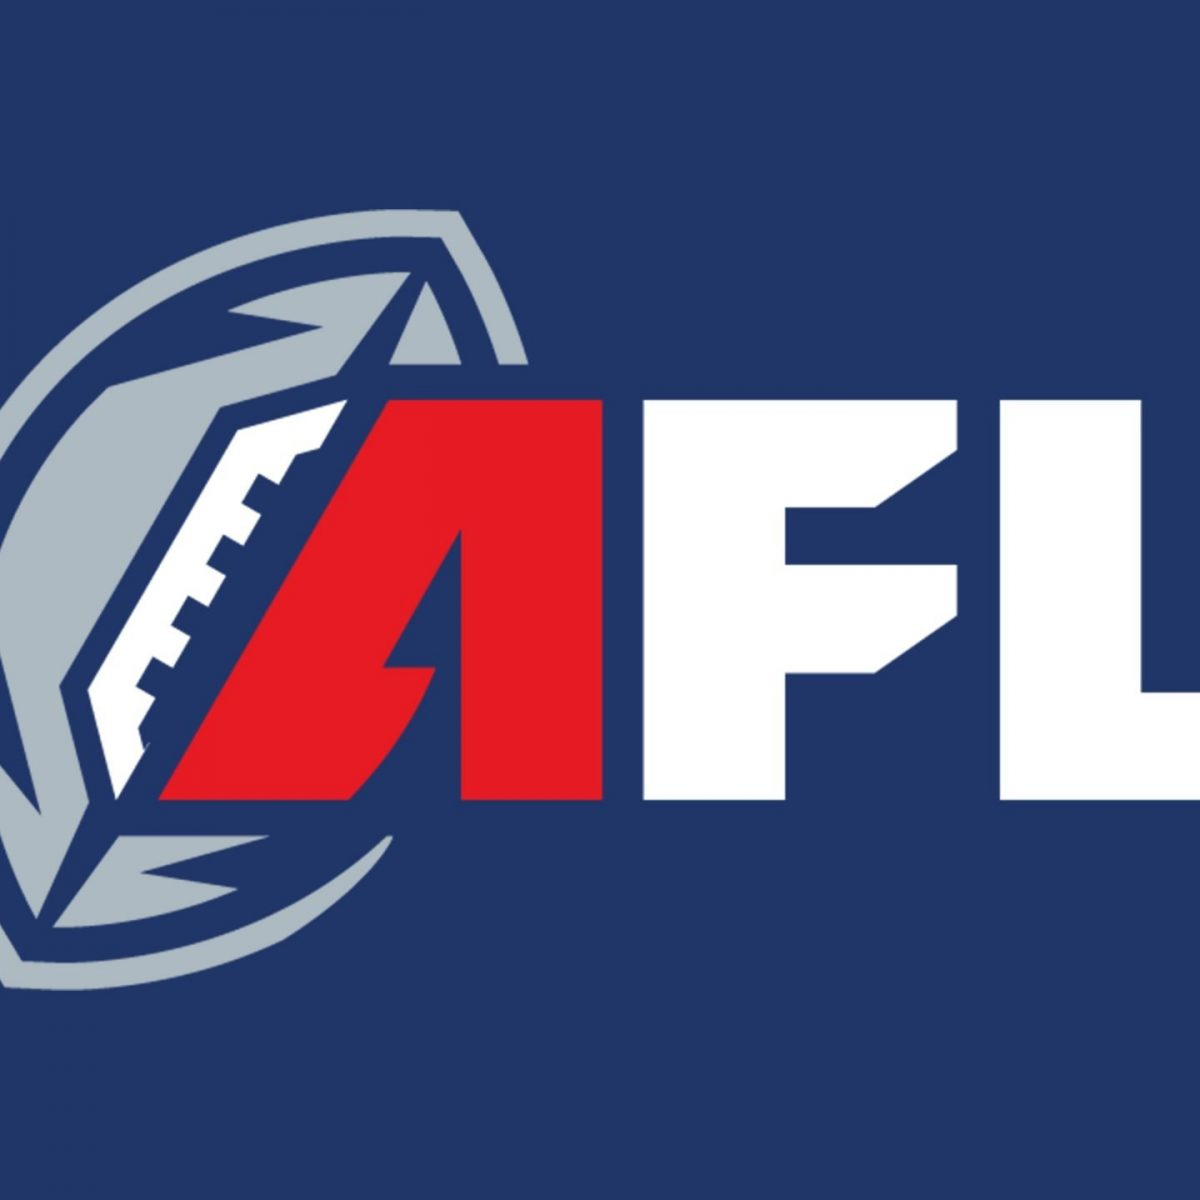 arena-football-logo